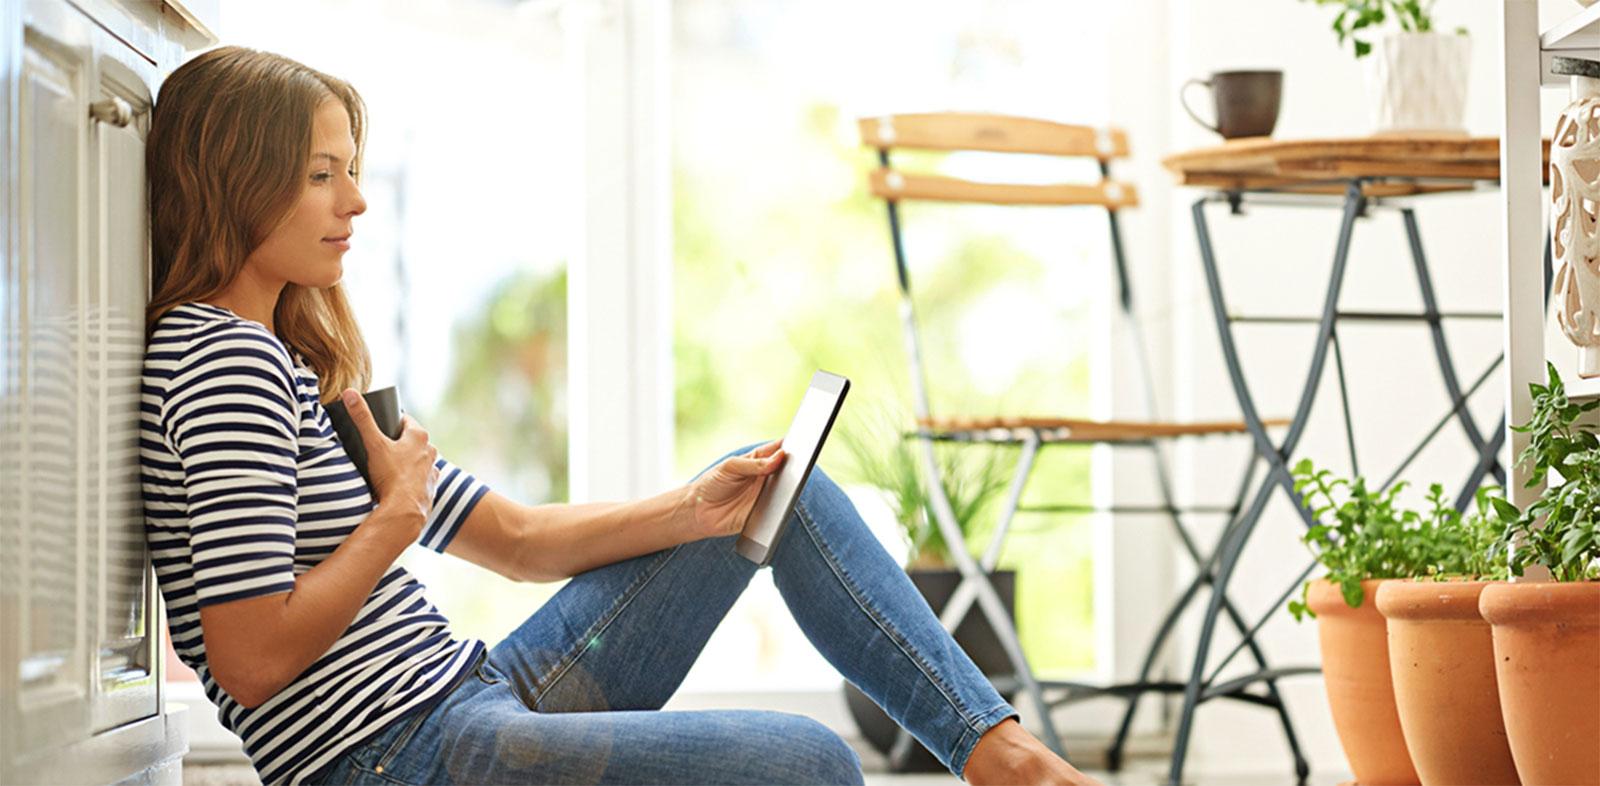 Netgear's Orbi takes on WiFi range with a wider range of